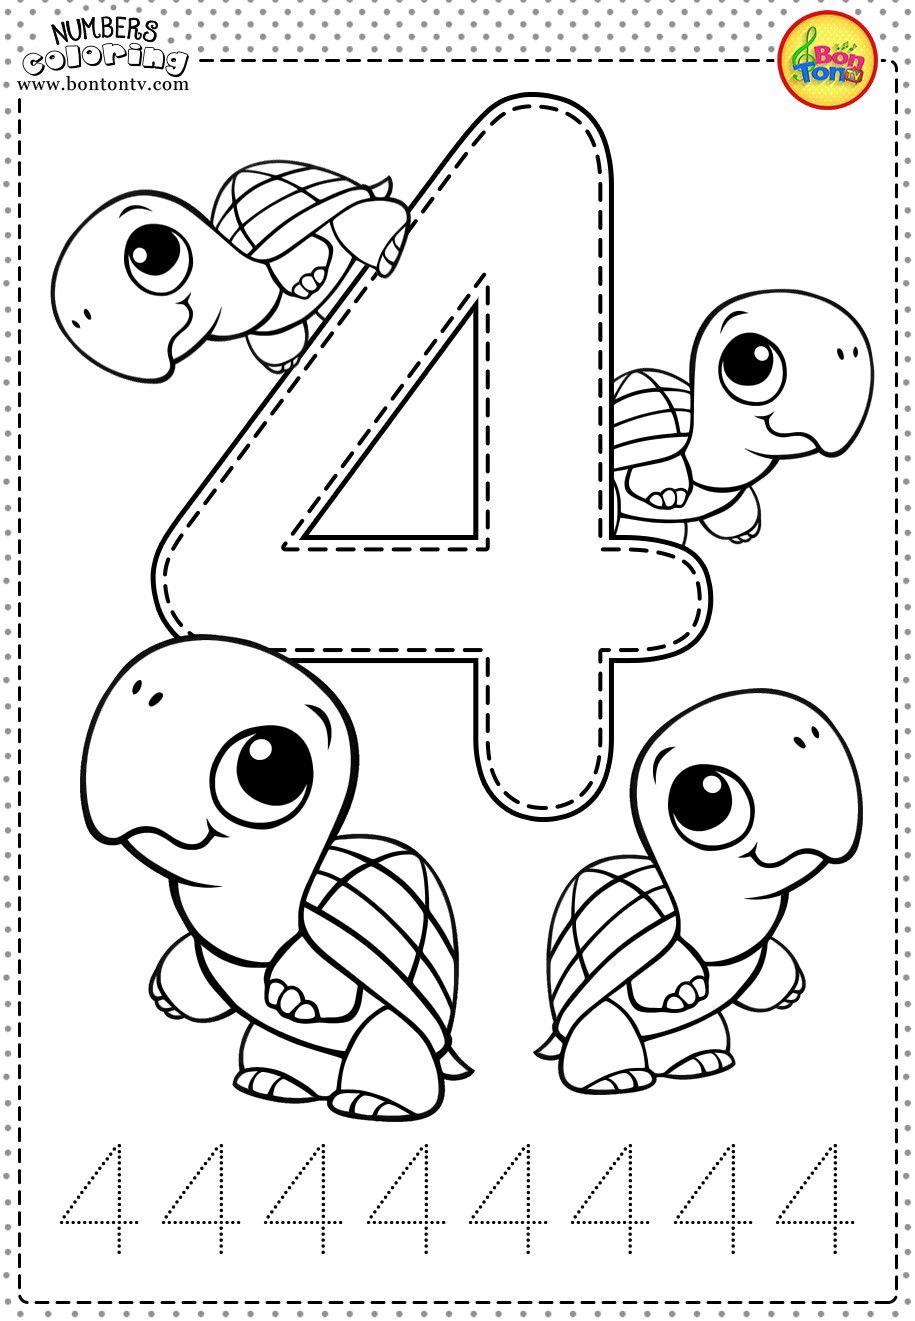 6 Letter A Coloring Worksheet Printable In 2020 Preschool Worksheets Free Printables Kids Learning Numbers Free Preschool Printables